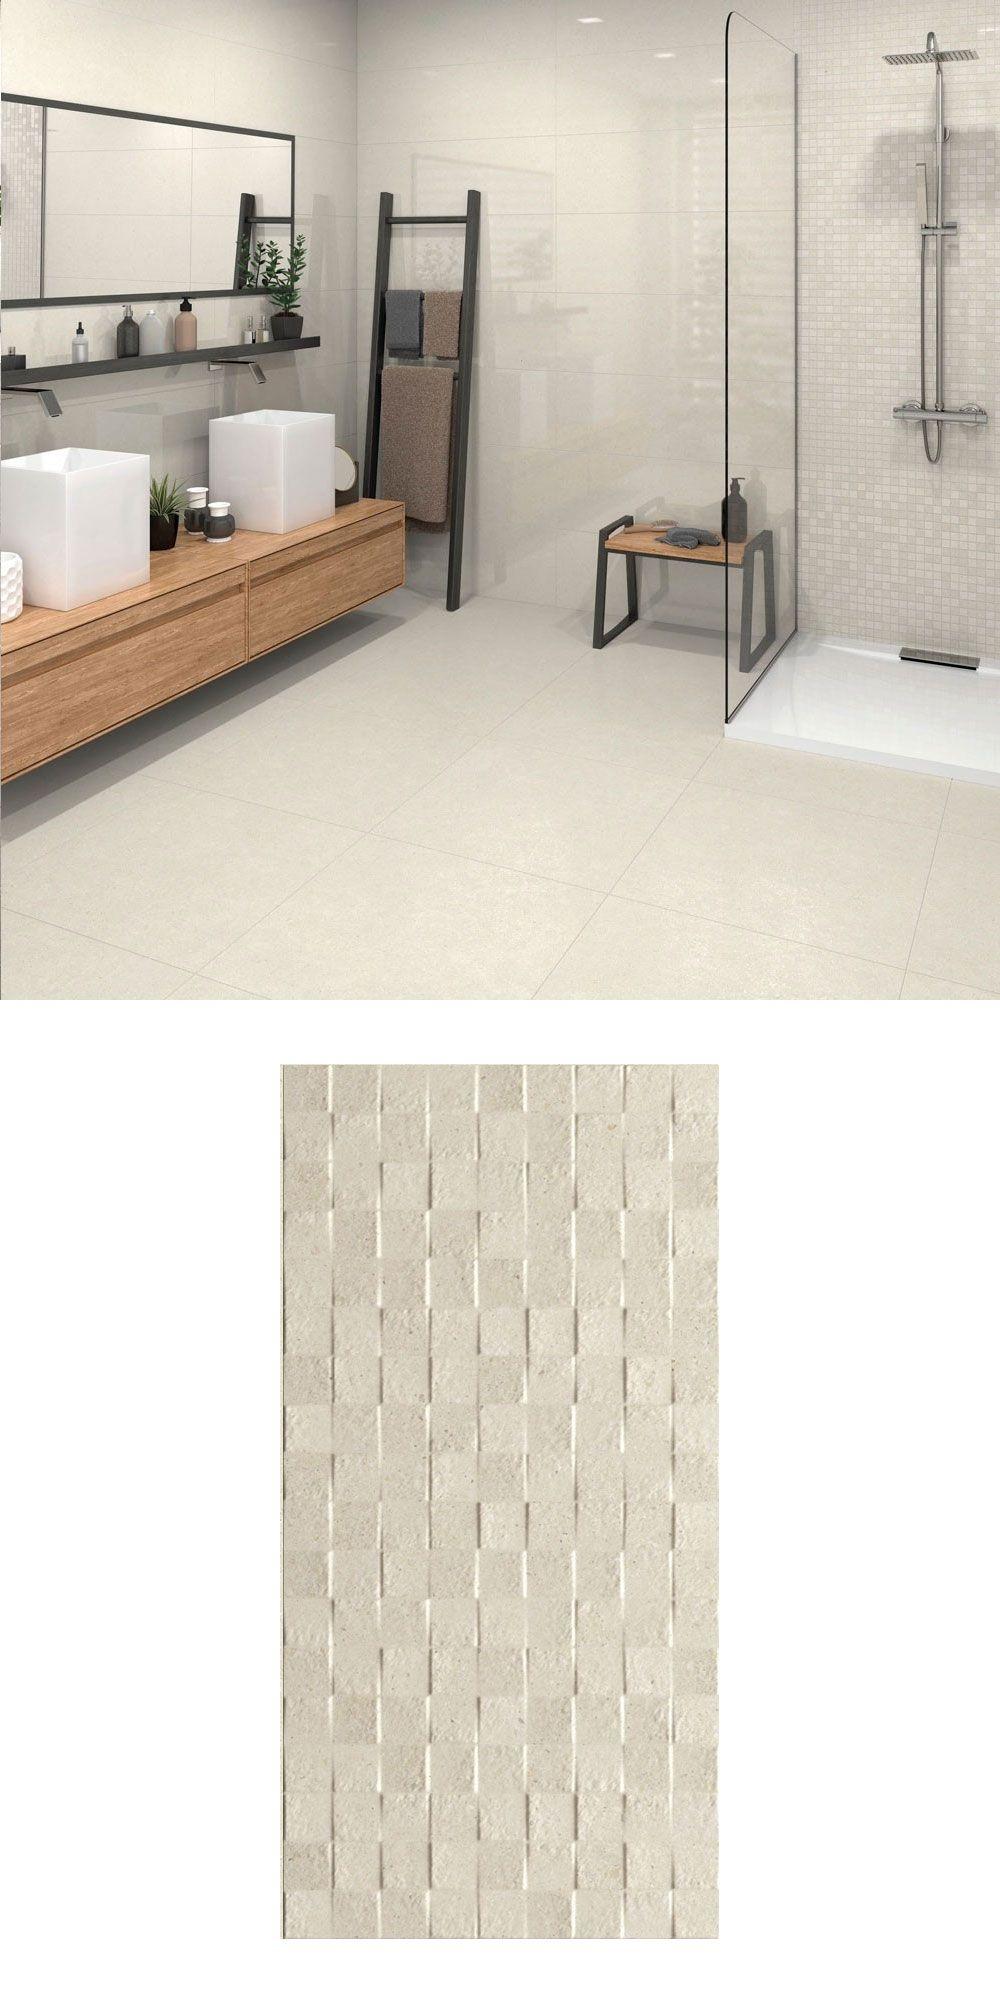 Troverta Cubic Cream 60x30 Tiles Tiles Wall Spaces Wall Tiles